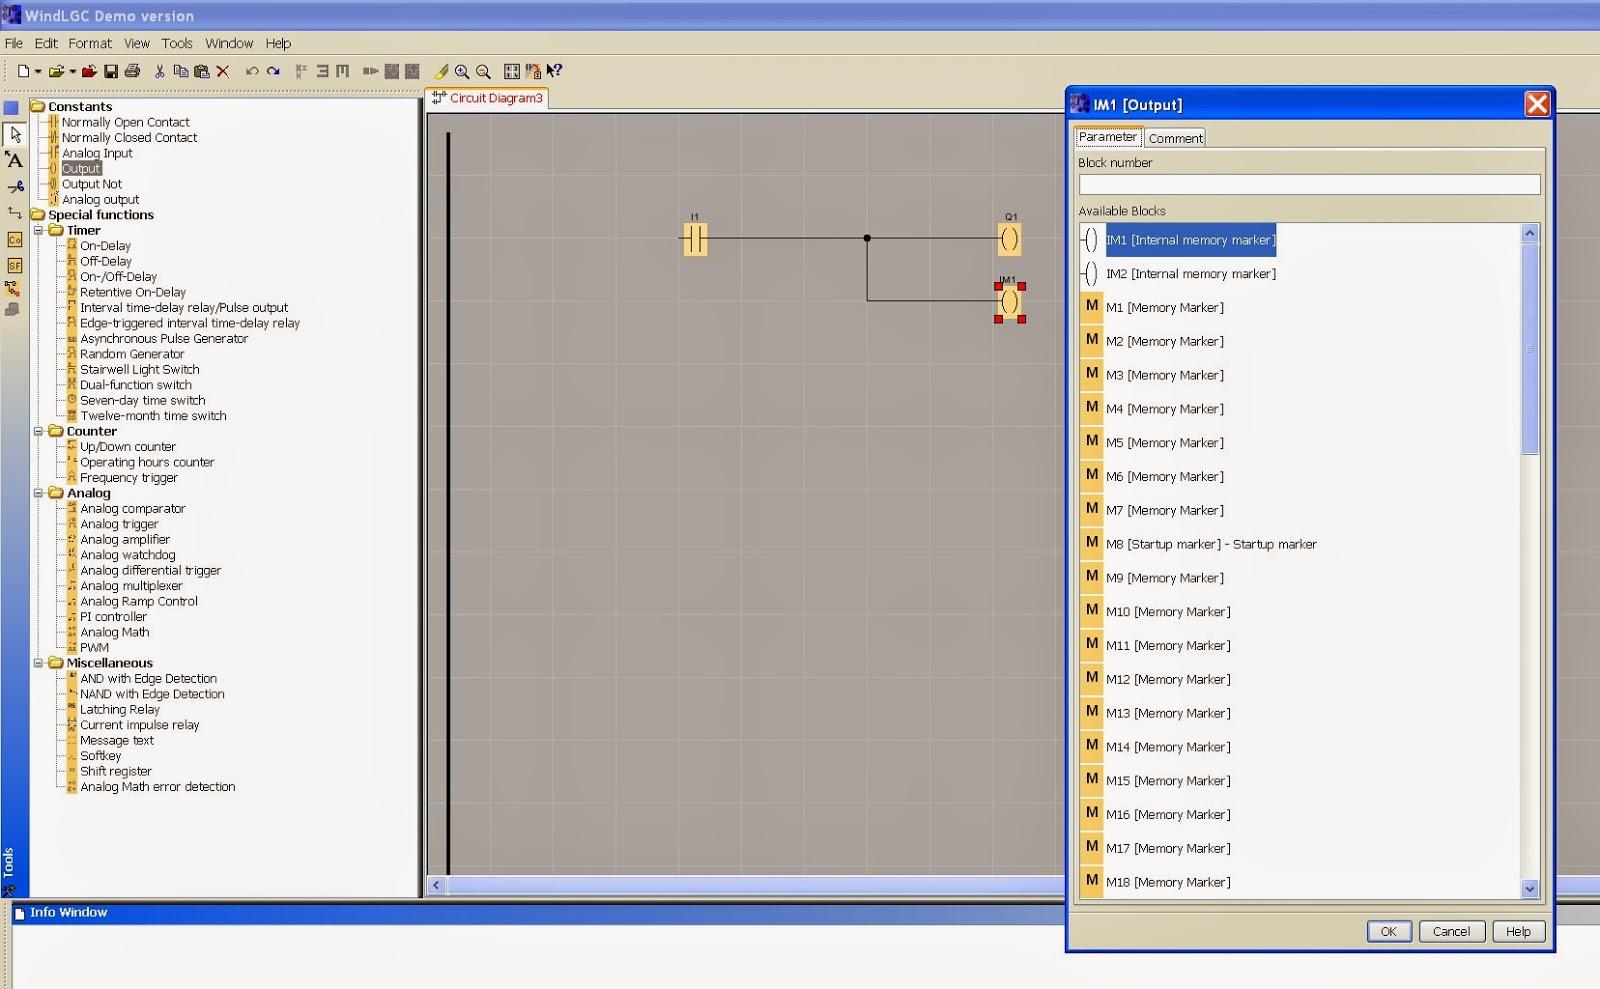 Take A Look At Windlgc Programming Software Ladder Logic Diagram Xor Image 6 Internal Memory Marker Output